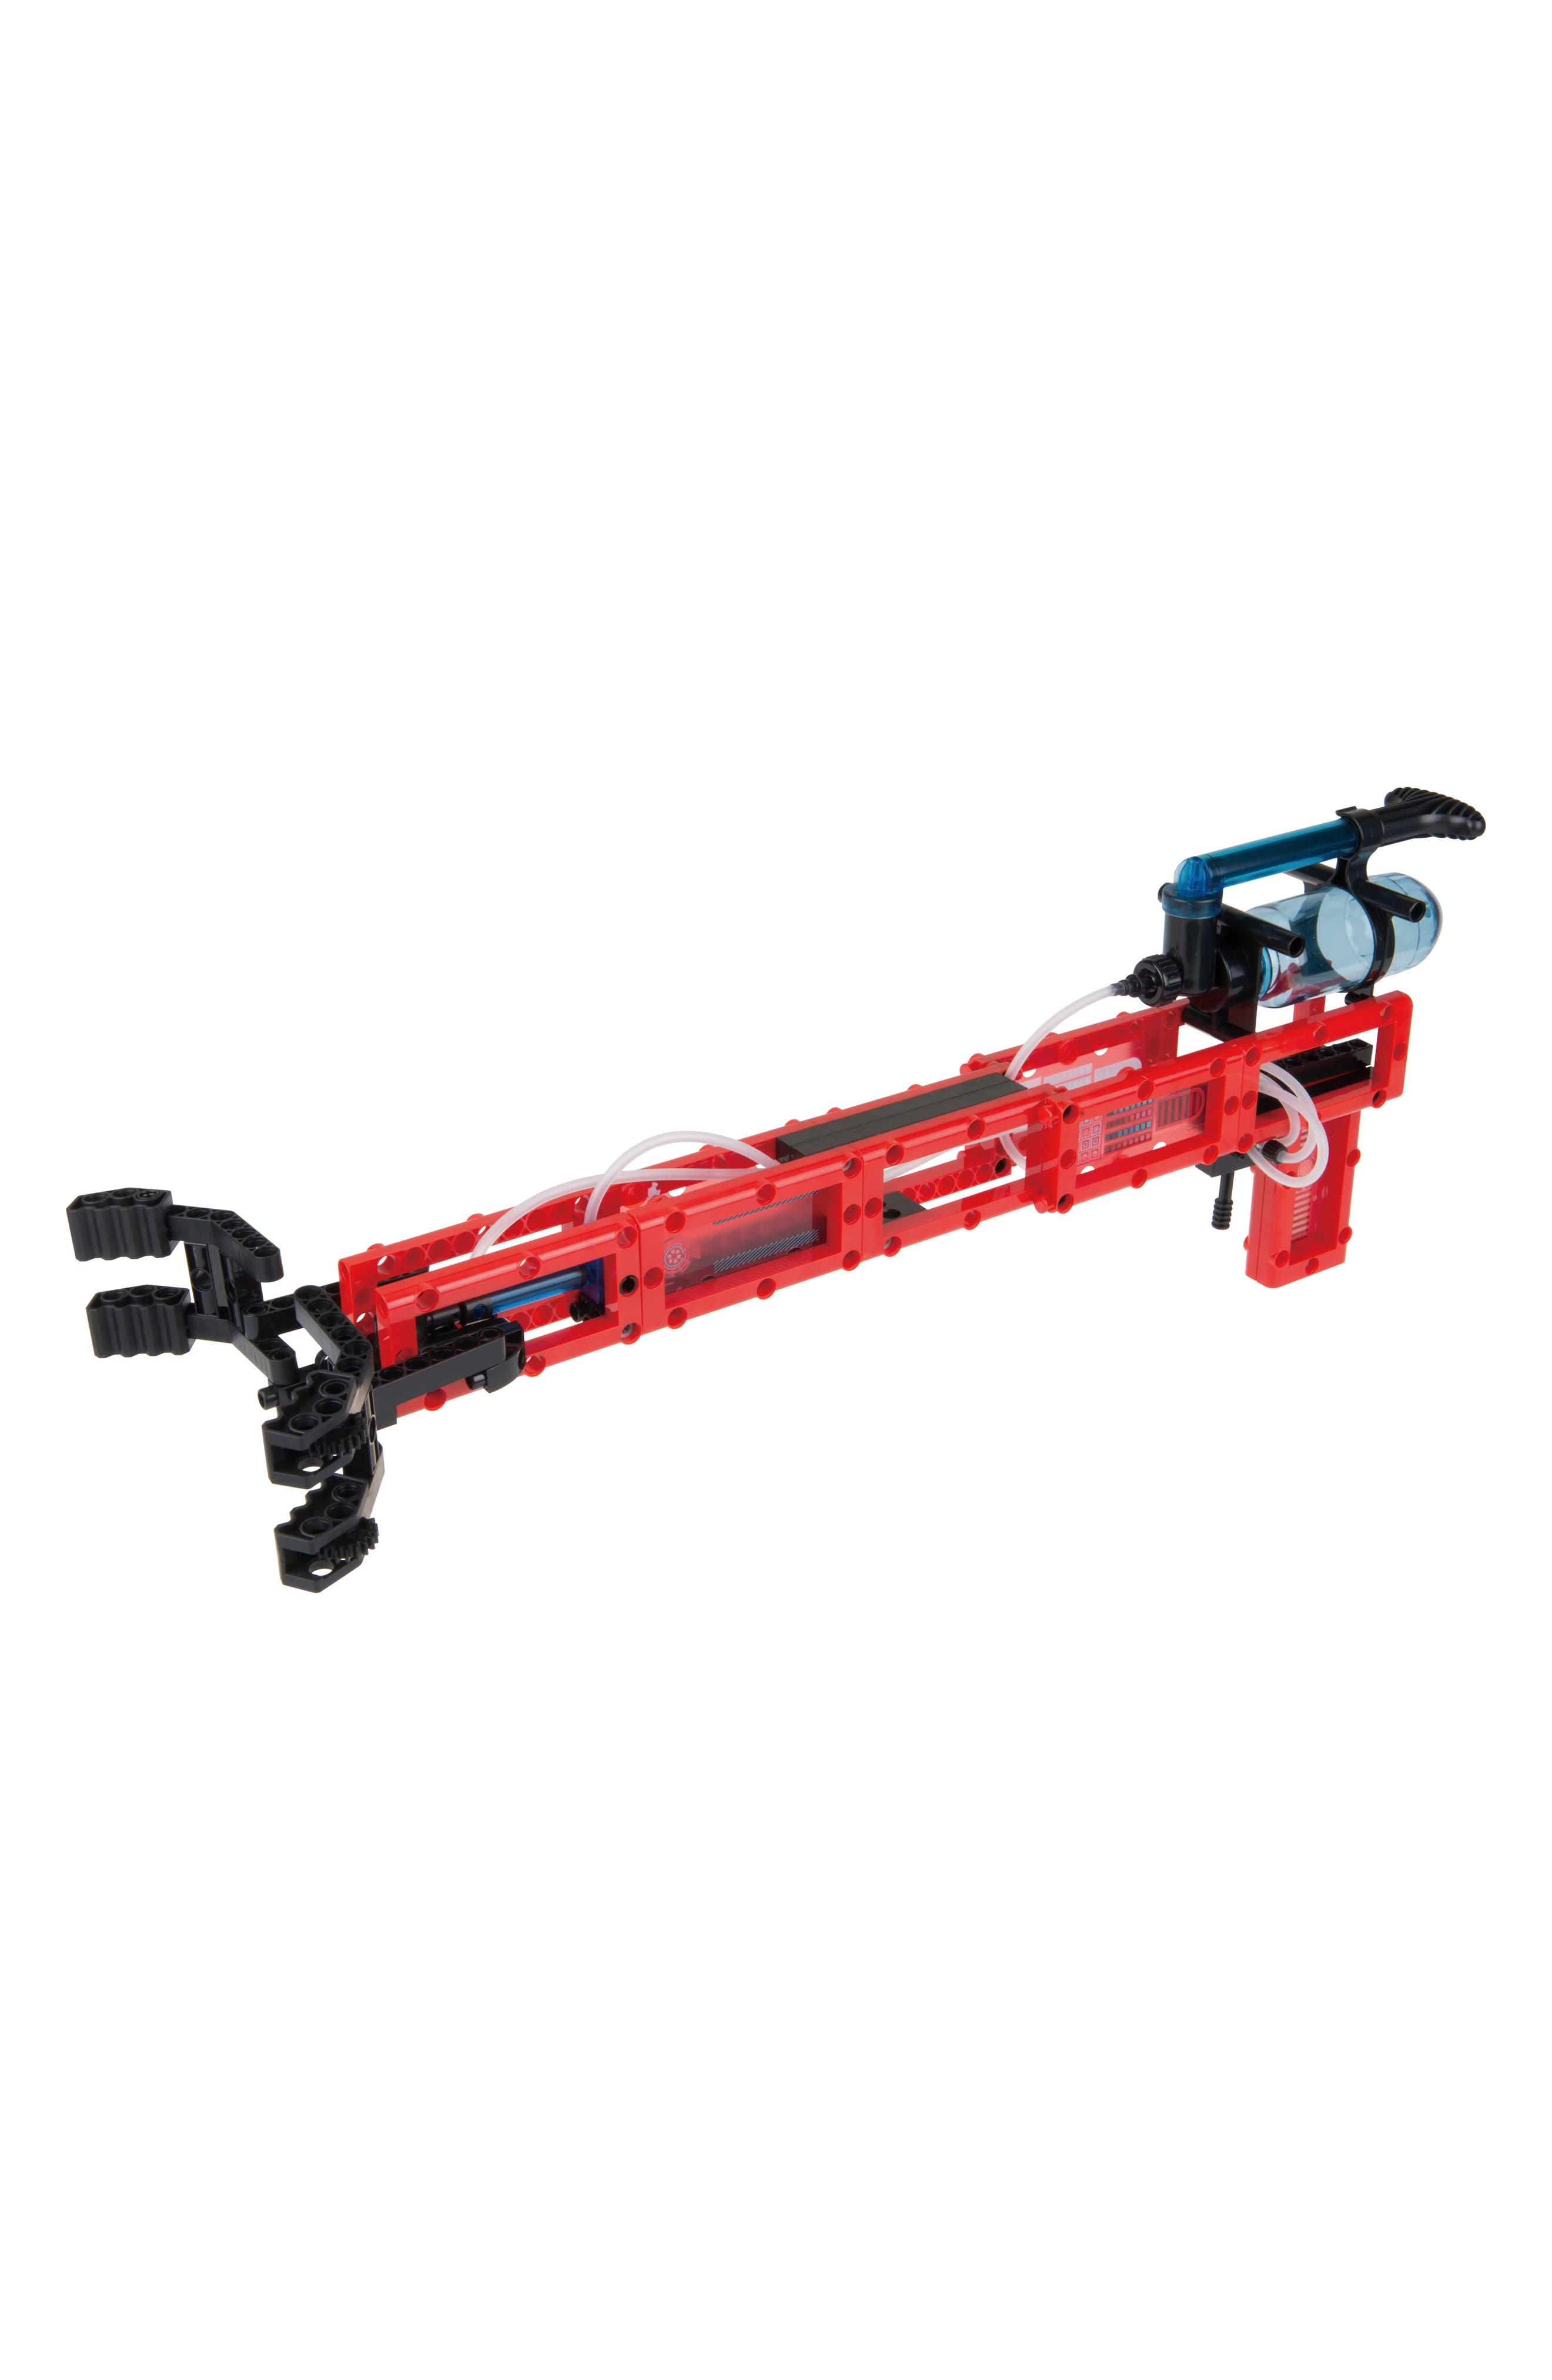 Mechanical Engineering Robotic Arms Kit,                             Alternate thumbnail 6, color,                             Multi